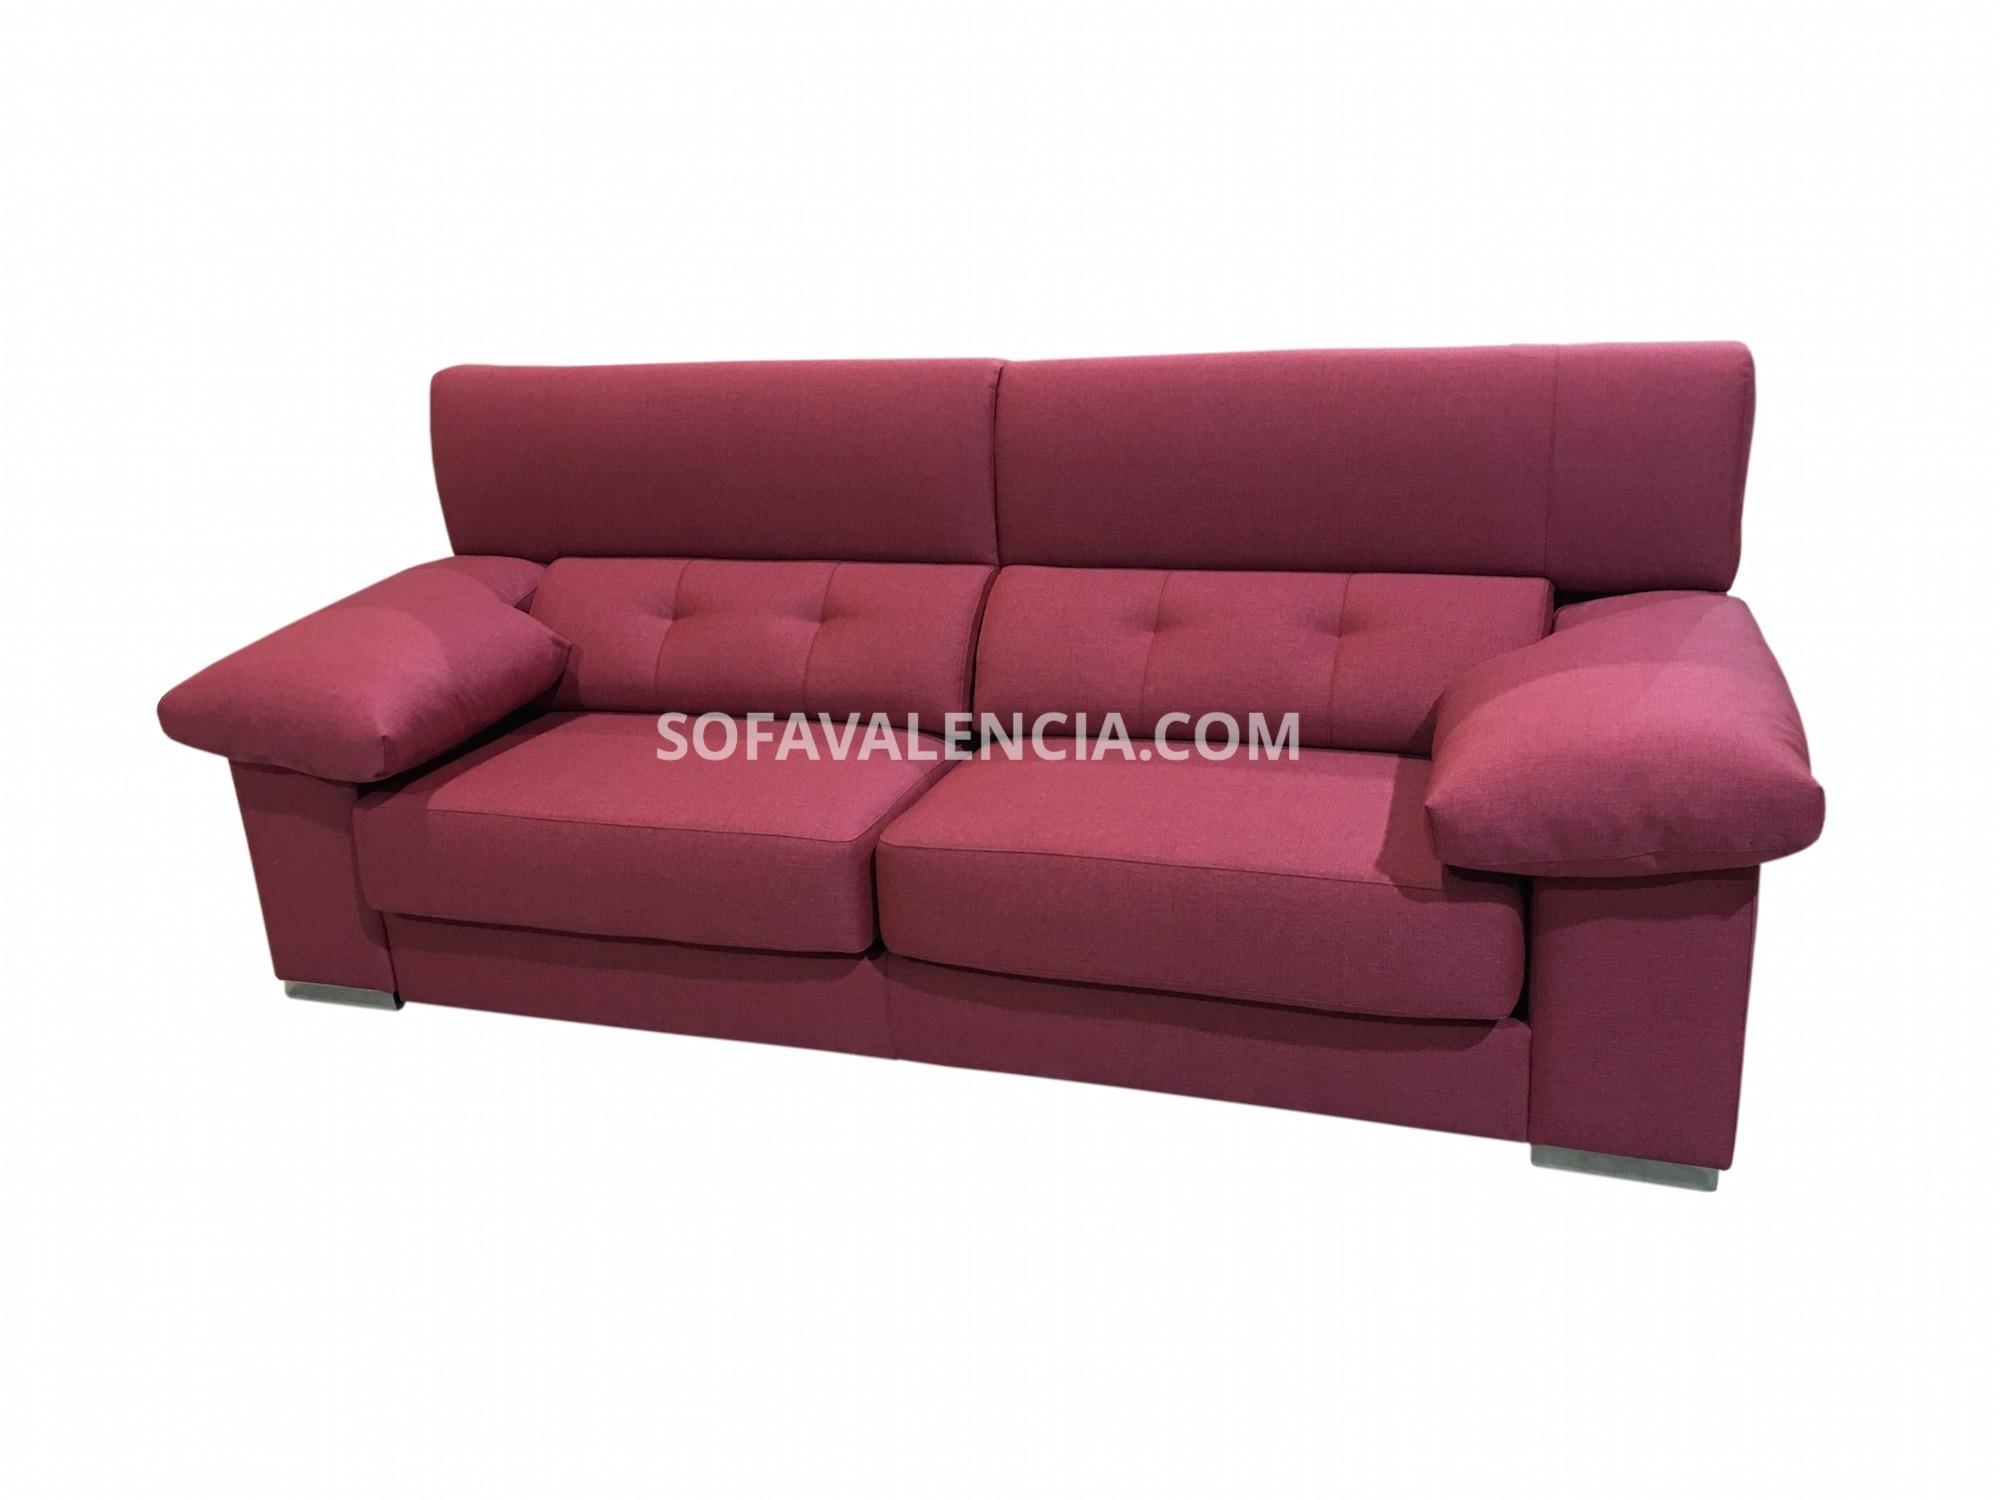 Sofa 3y2 barato sofa modelo troyer foto principal 44 - Sofas en vitoria ...